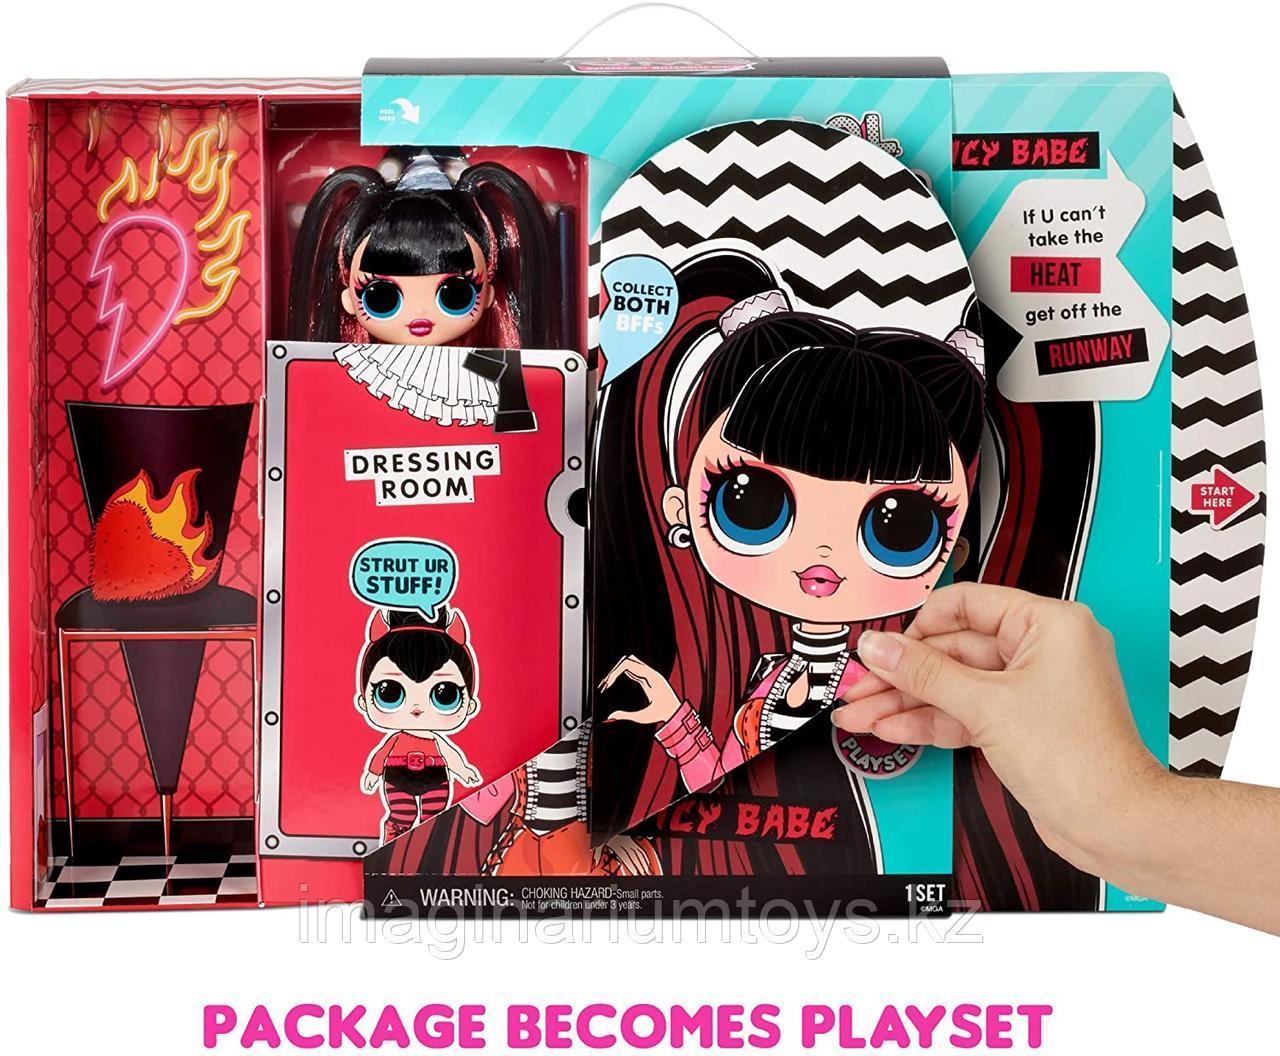 Большая Кукла ЛОЛ ОМГ 4 серия LOL OMG Spicy Babe - фото 5